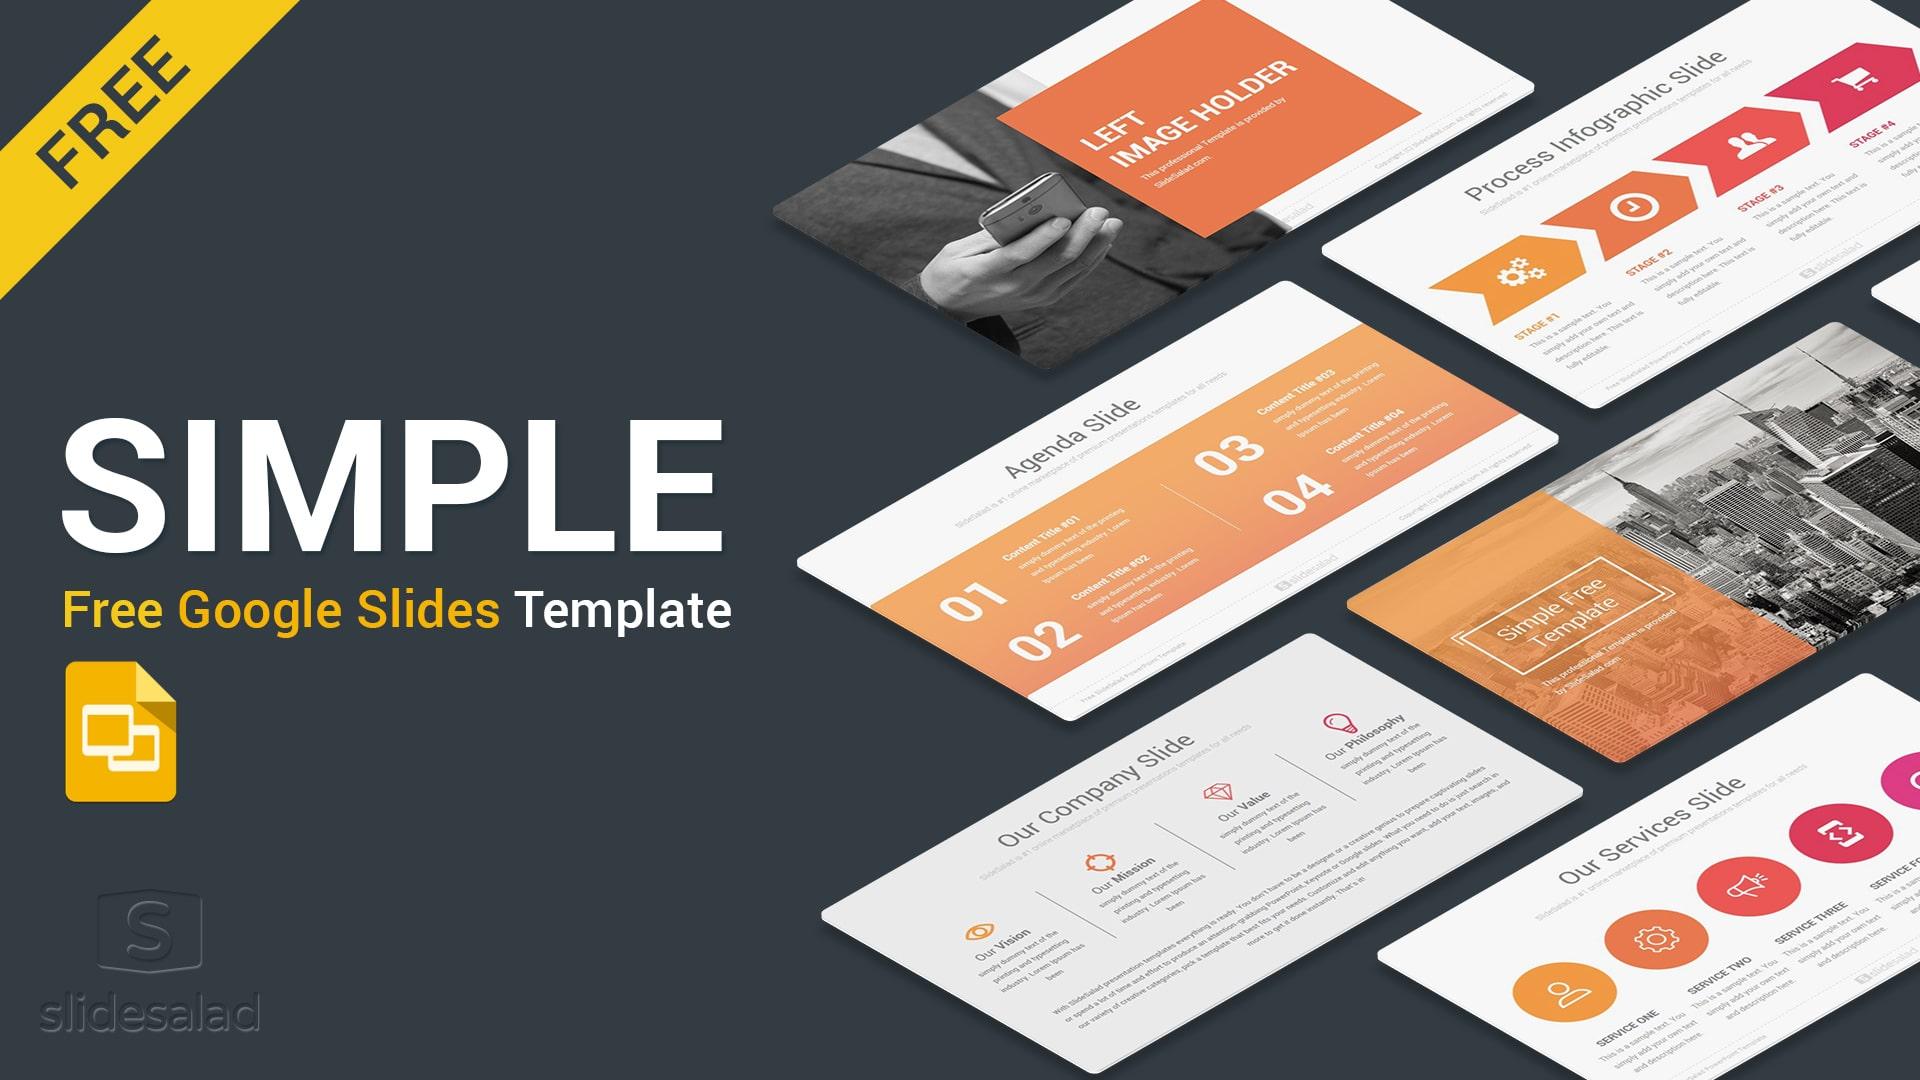 Simple Free Google Slides Presentation Template